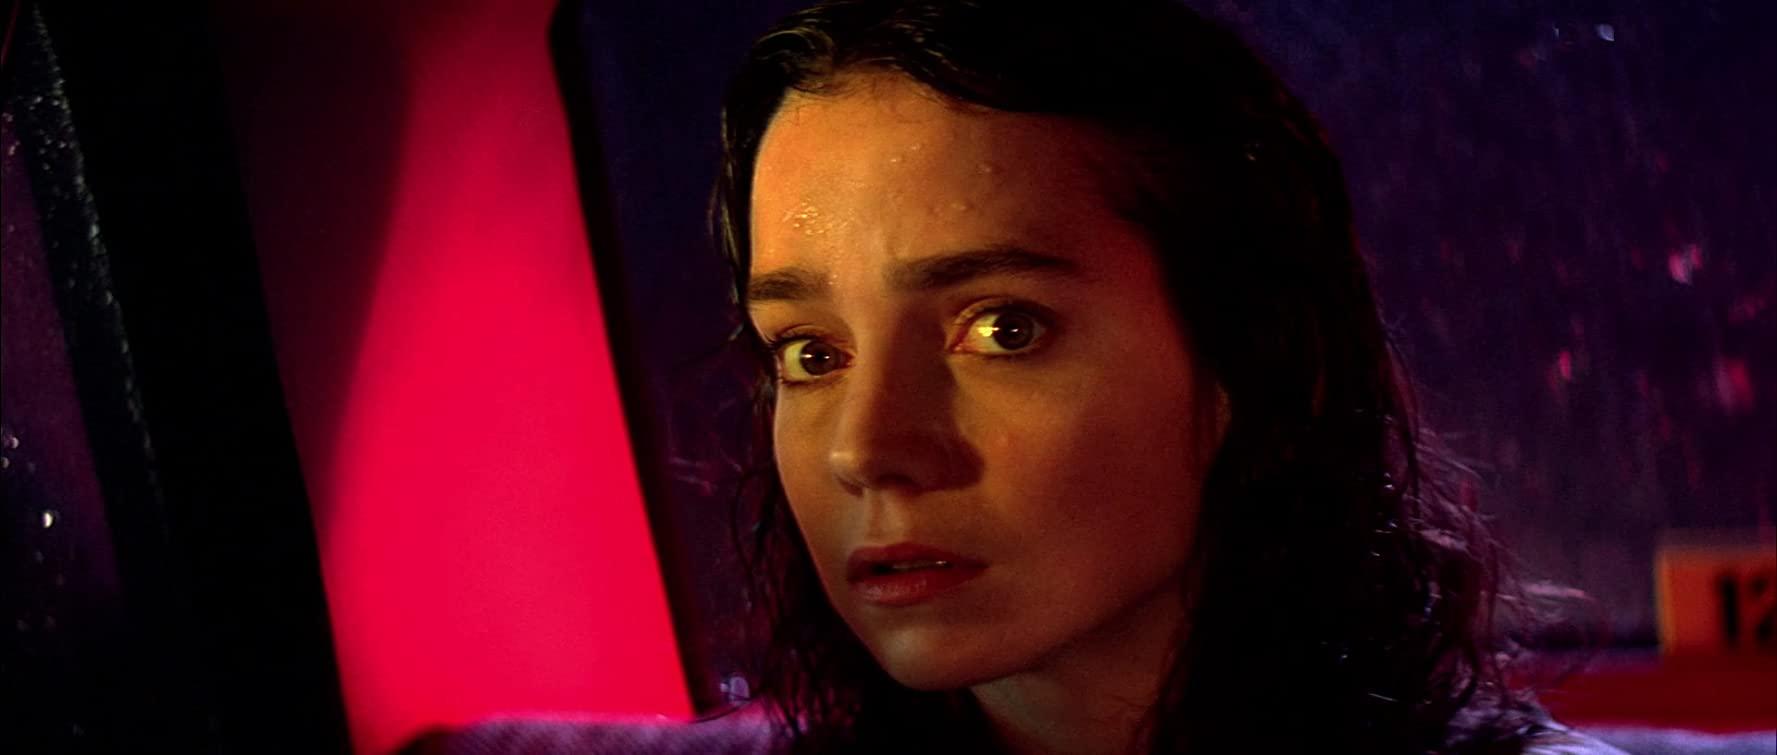 Суспирия (Suspiria) 1977